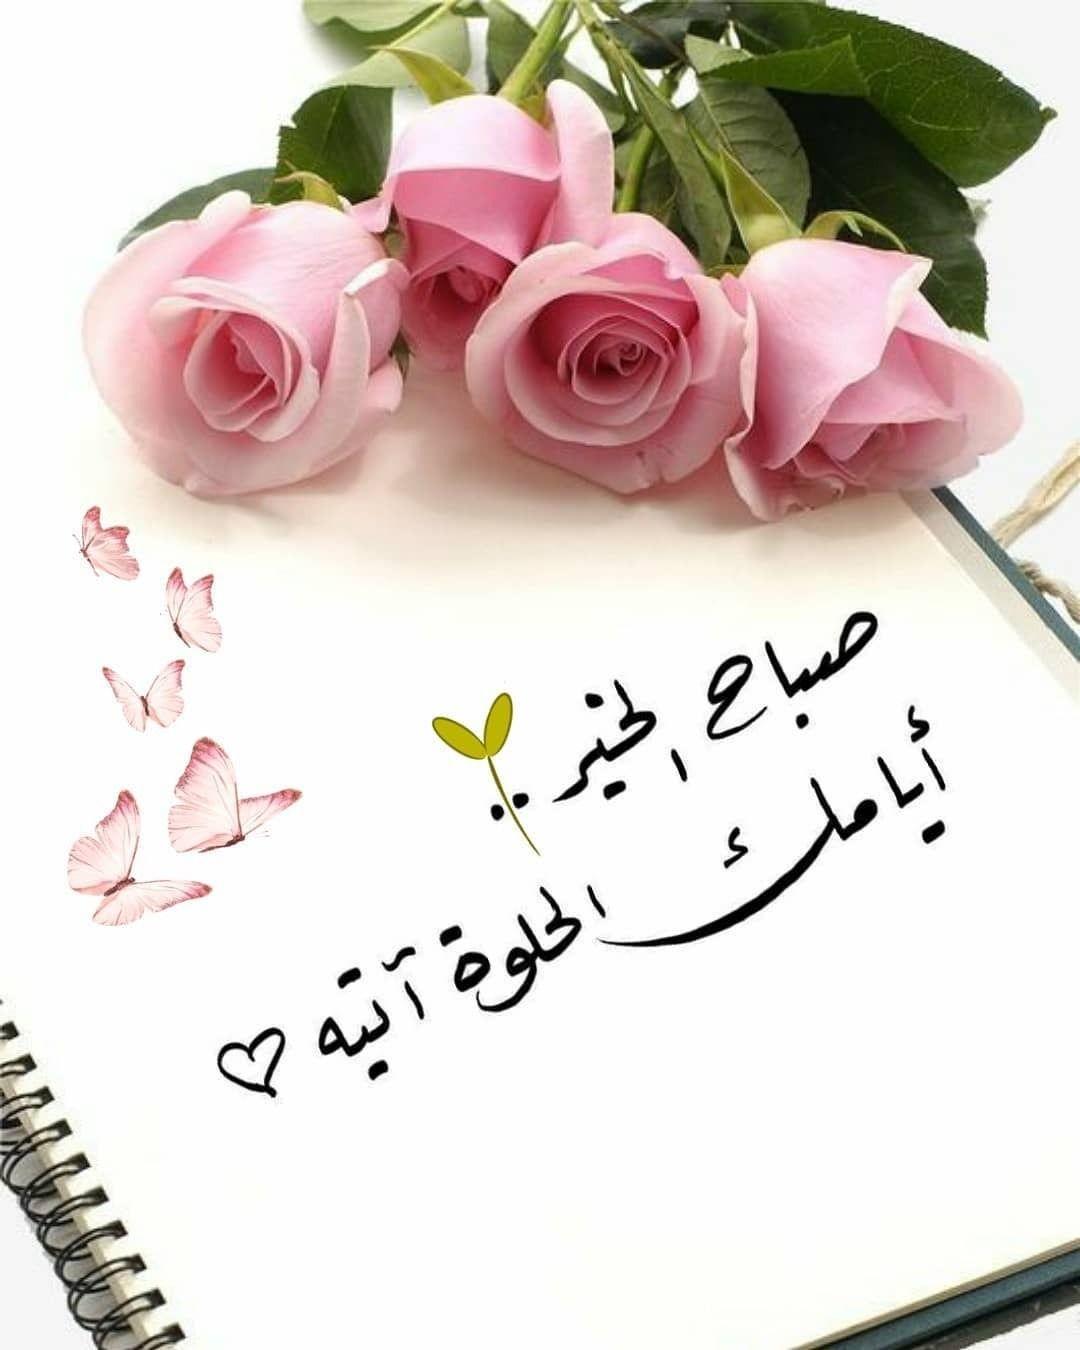 Pin By Mayflower On Allah Names Beautiful Morning Messages Good Morning Beautiful Images Good Morning Arabic